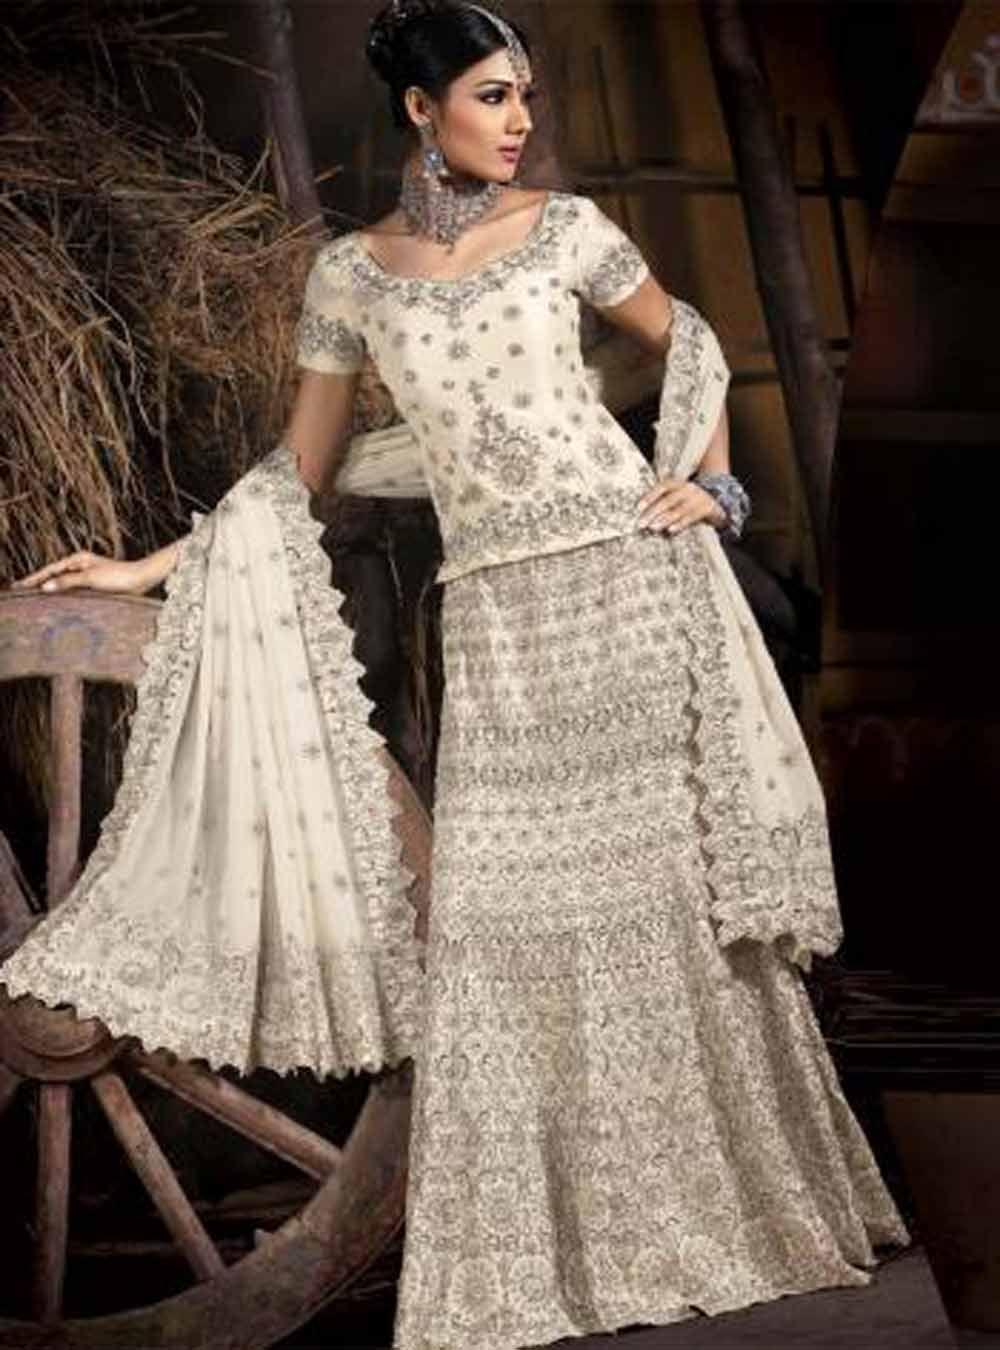 Hindu wedding dress  sari wedding dress  sari wedding dress  Pinterest  South indian